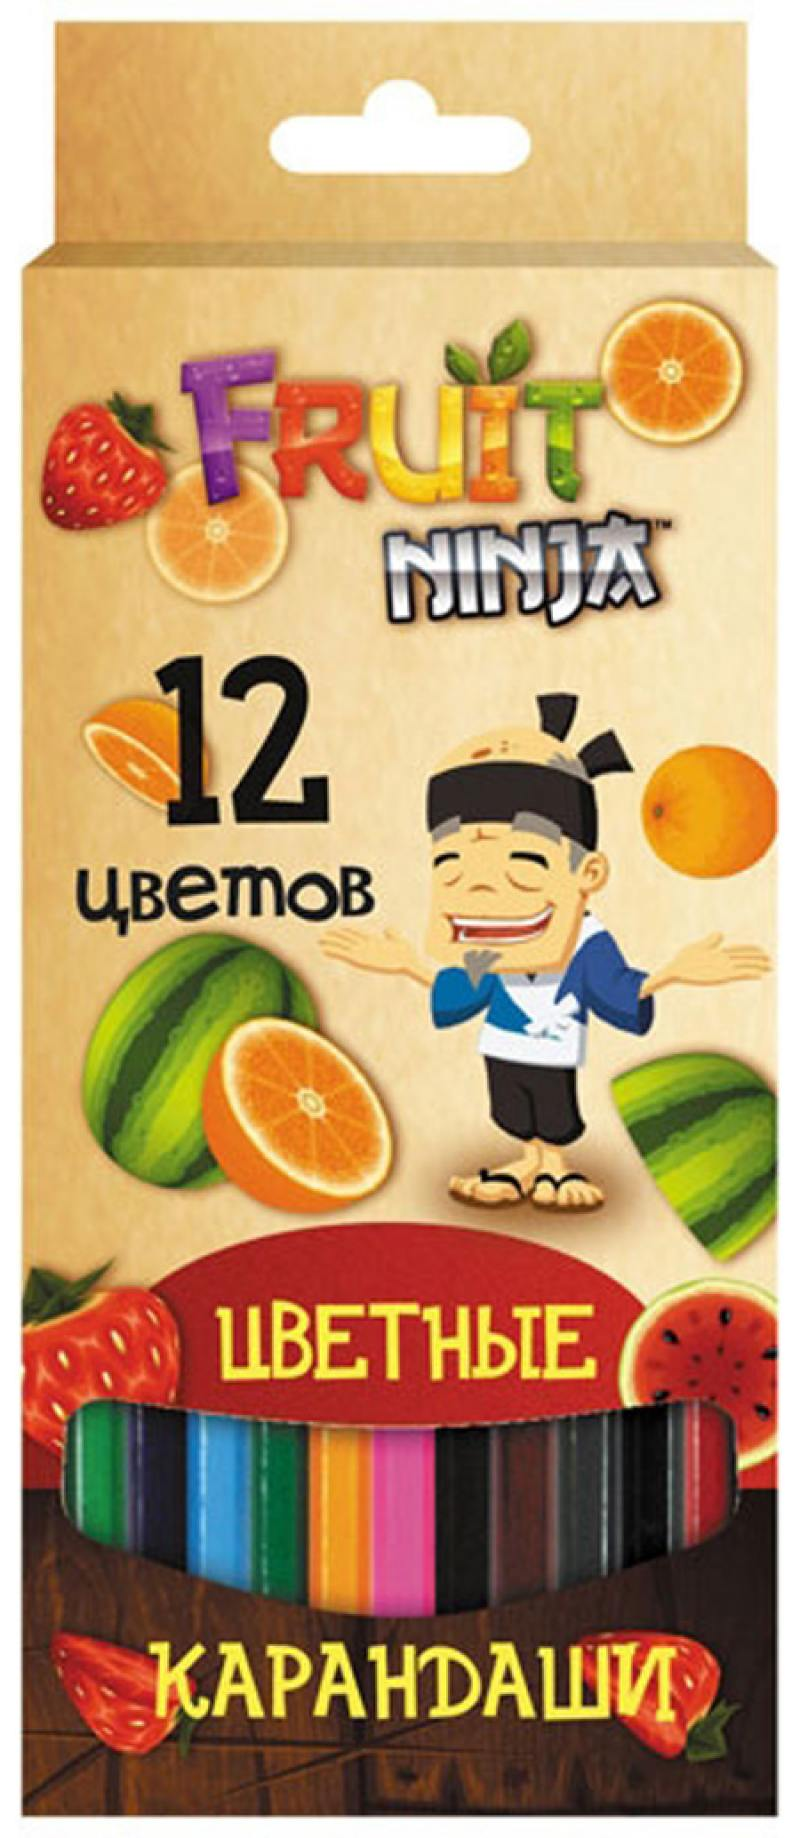 Набор цветных карандашей Action! Fruit Ninja 12 шт FN-ACP205-12 FN-ACP205-12 action набор цветных карандашей 12 цветов